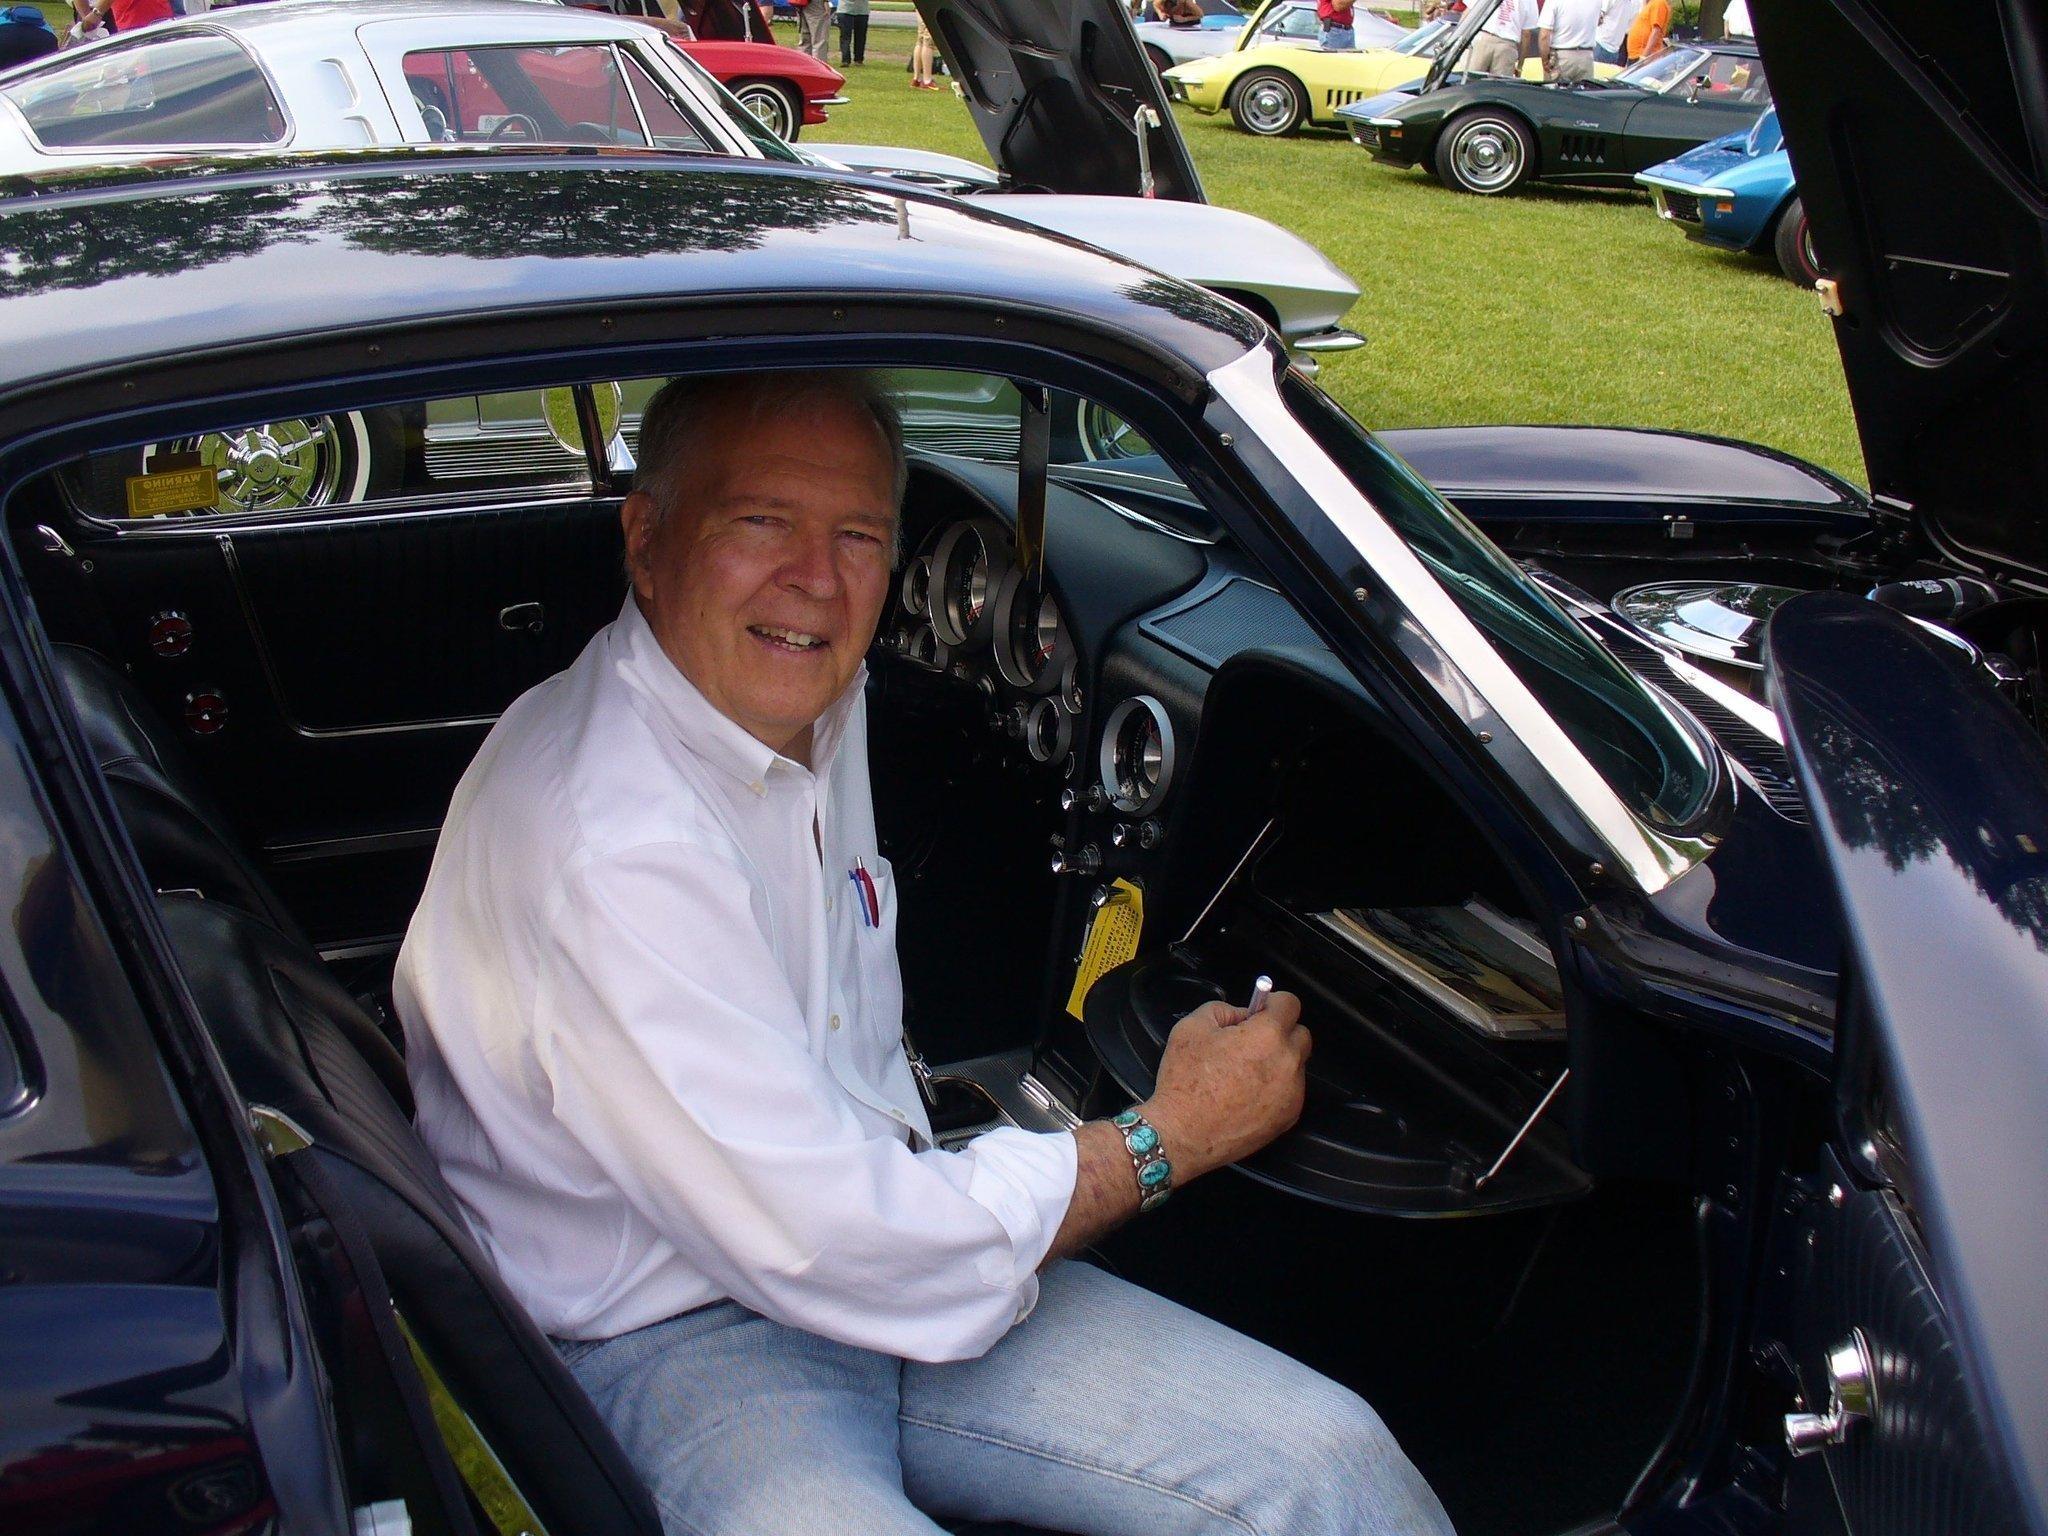 National Corvette Museum >> Vote designer-racer Brock into Corvette Hall of Fame - The ...